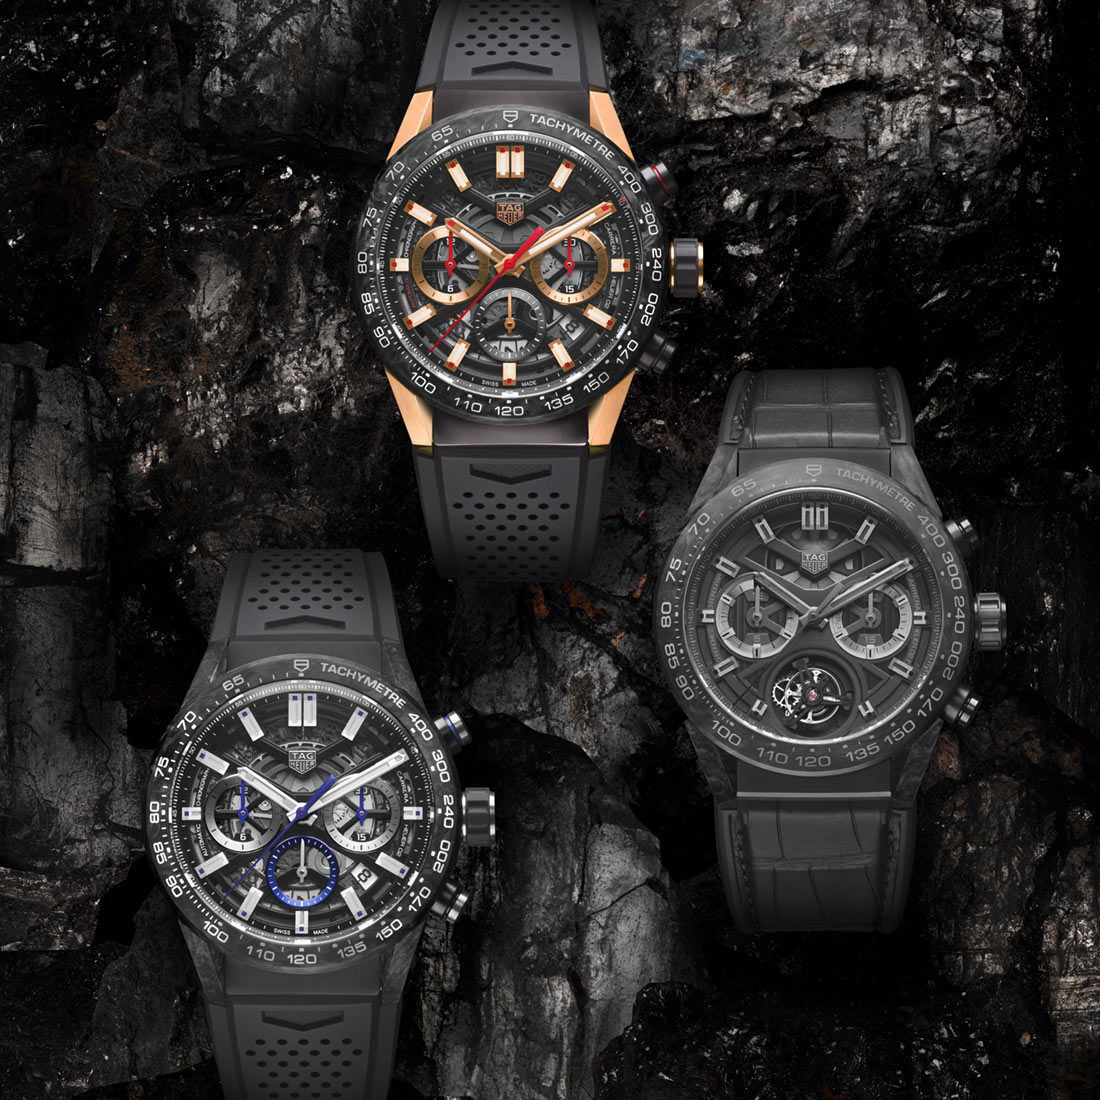 Luxury TAG Heuer Carrera & Heuer 02 Replica Watches